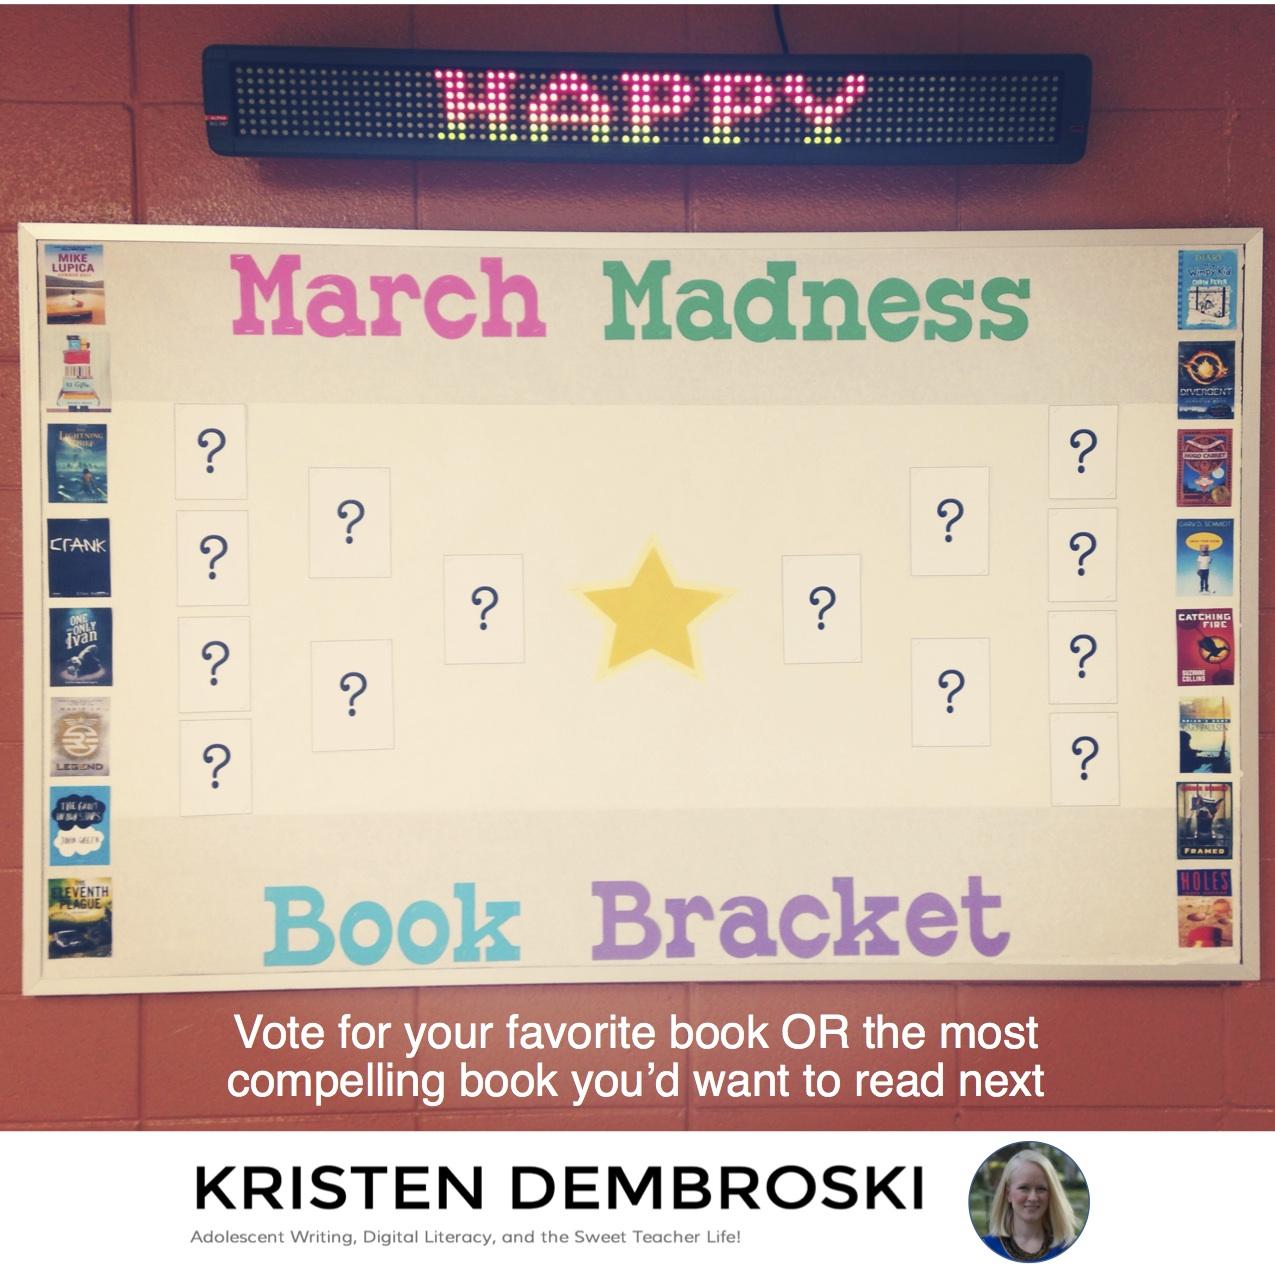 March Madness Book Bracket | Kristen Dembroski, Ph.D.